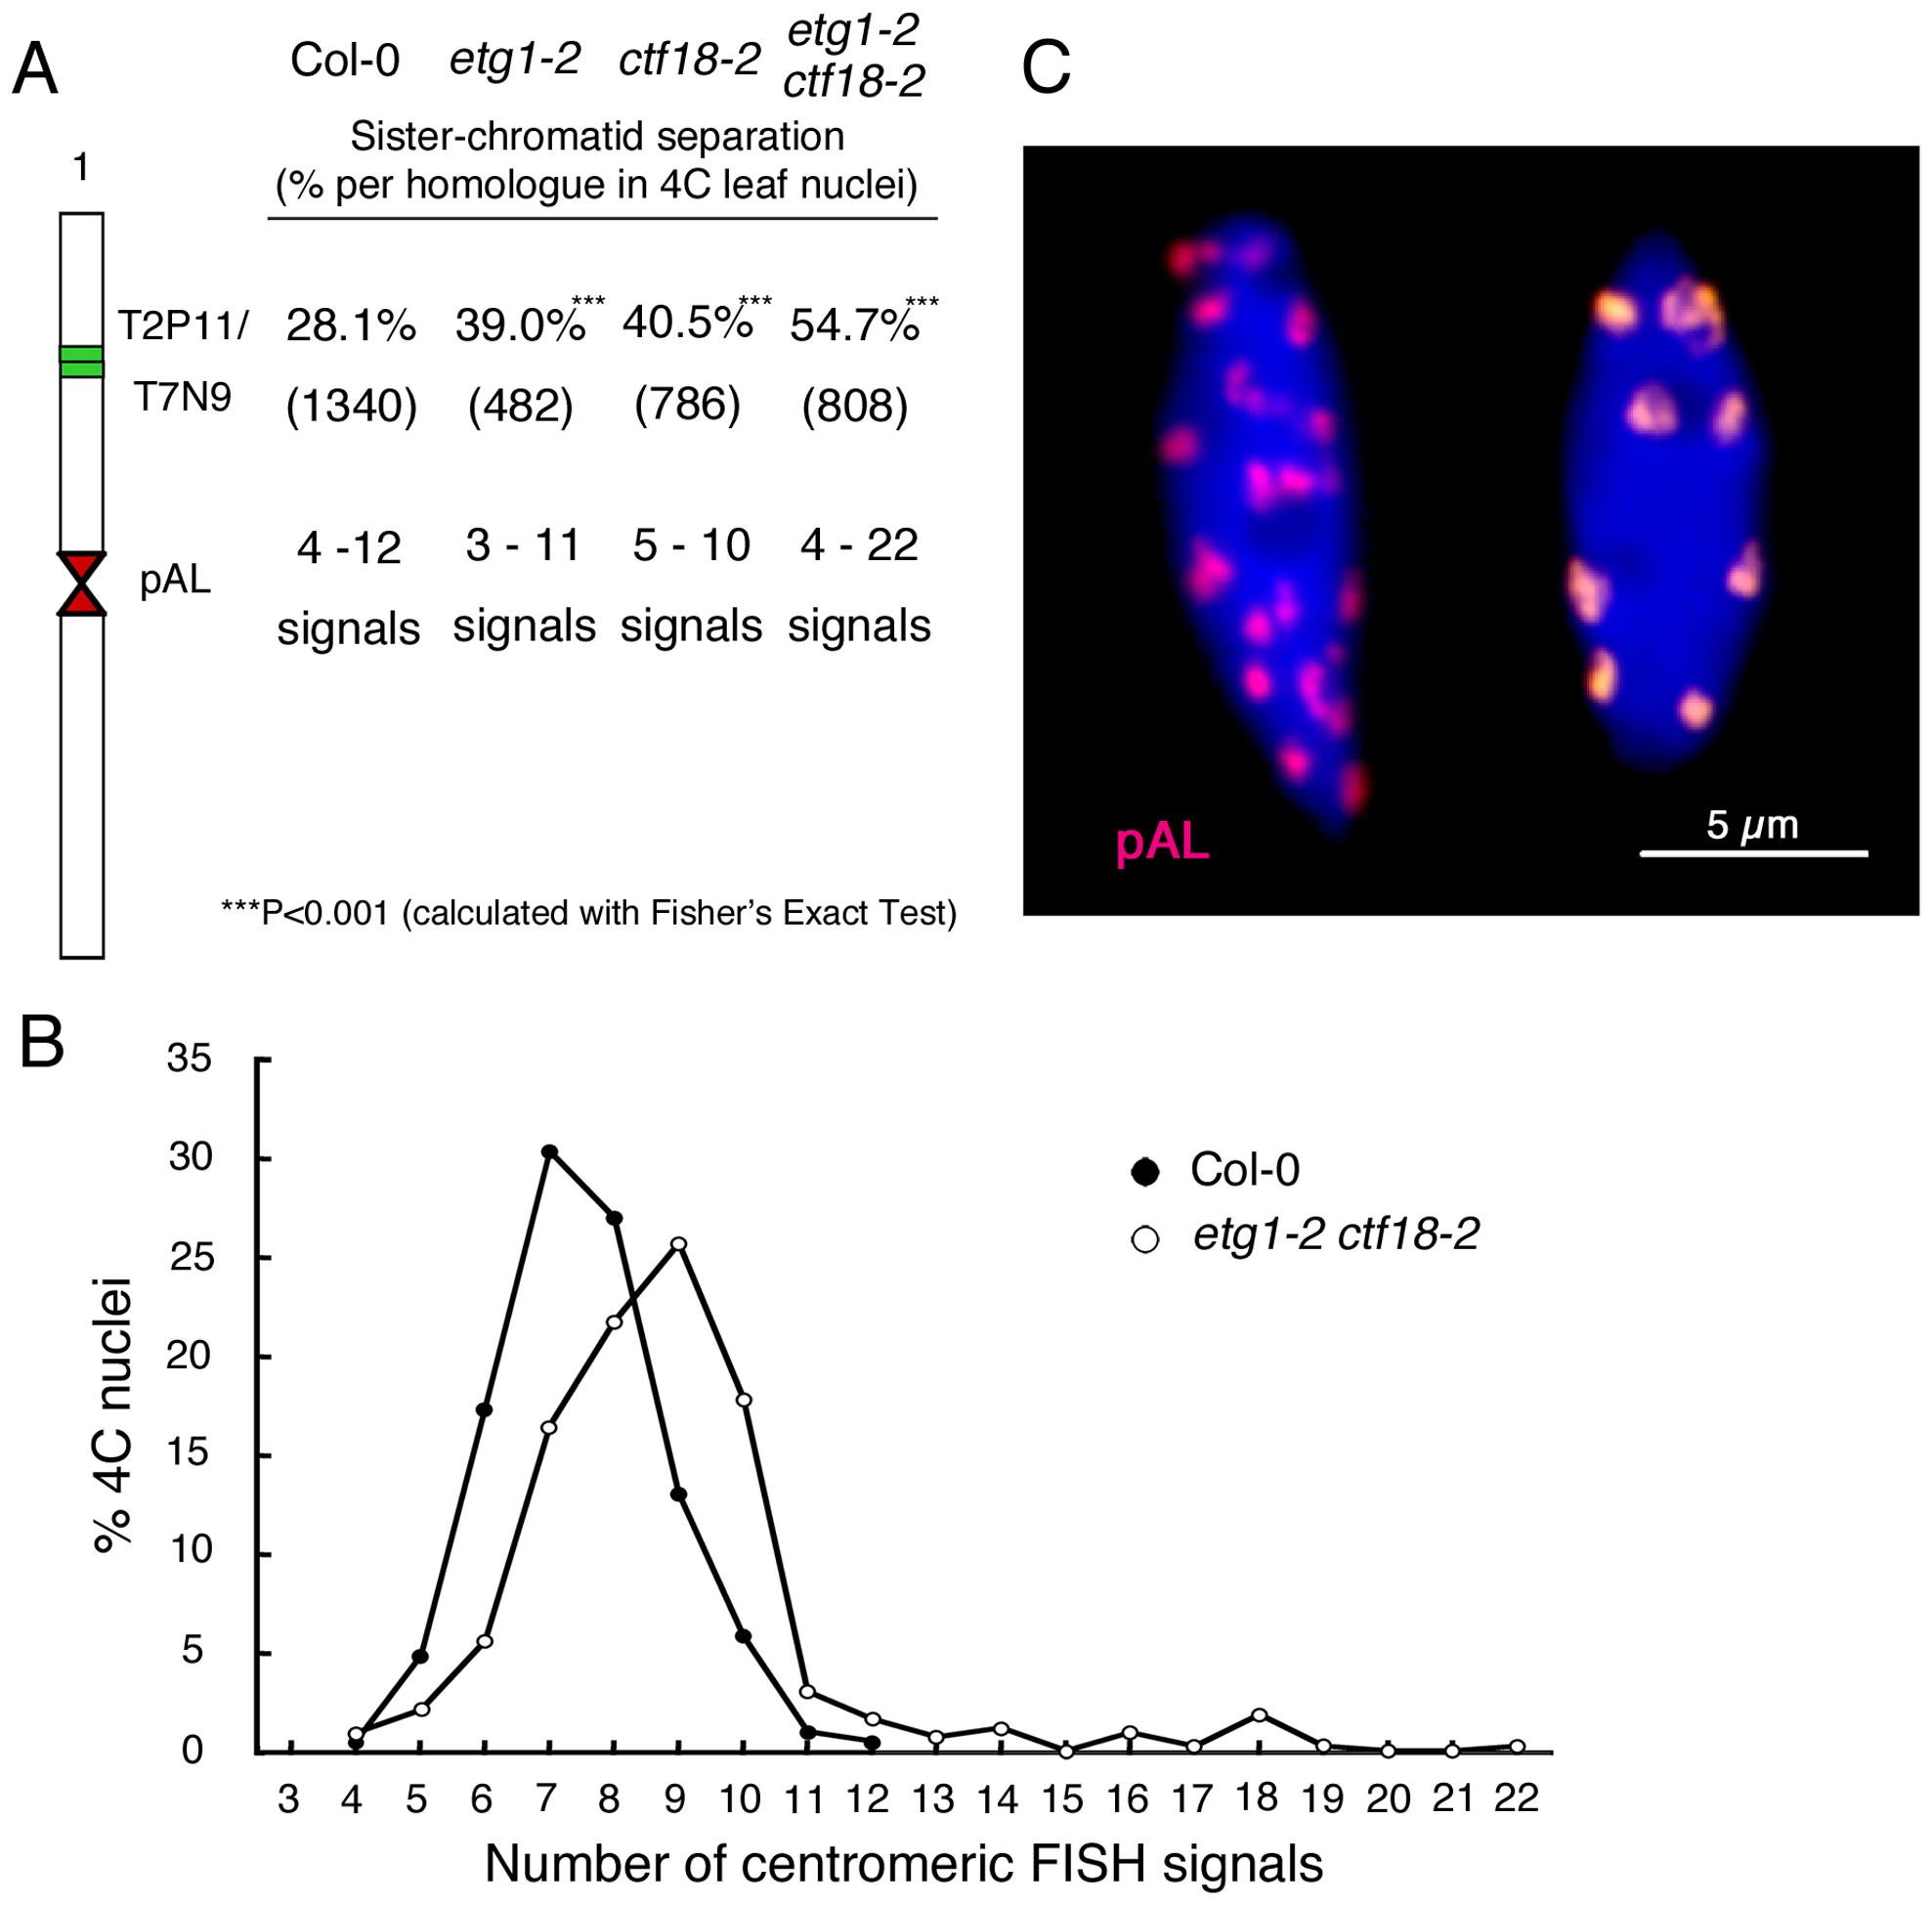 Synergistic effect of <i>etg1</i> and <i>ctf18</i> on sister chromatid cohesion in 4C leaf nuclei.